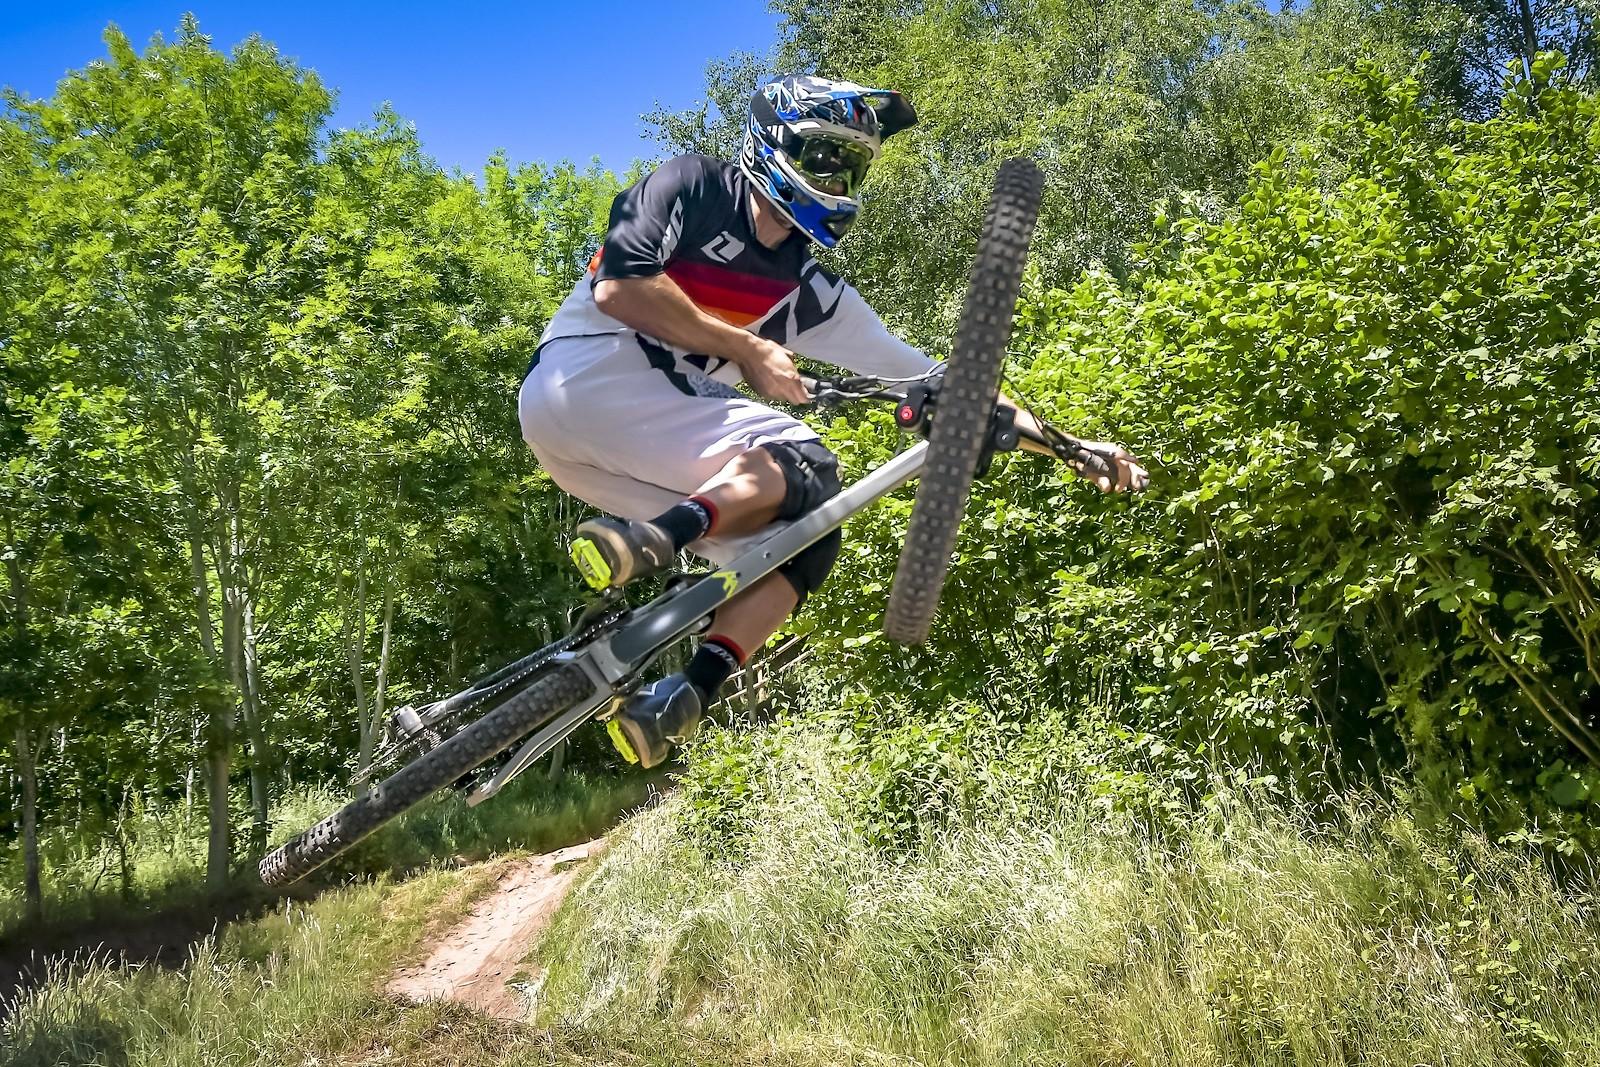 ROB0393 - robbarkerimages2017 - Mountain Biking Pictures - Vital MTB